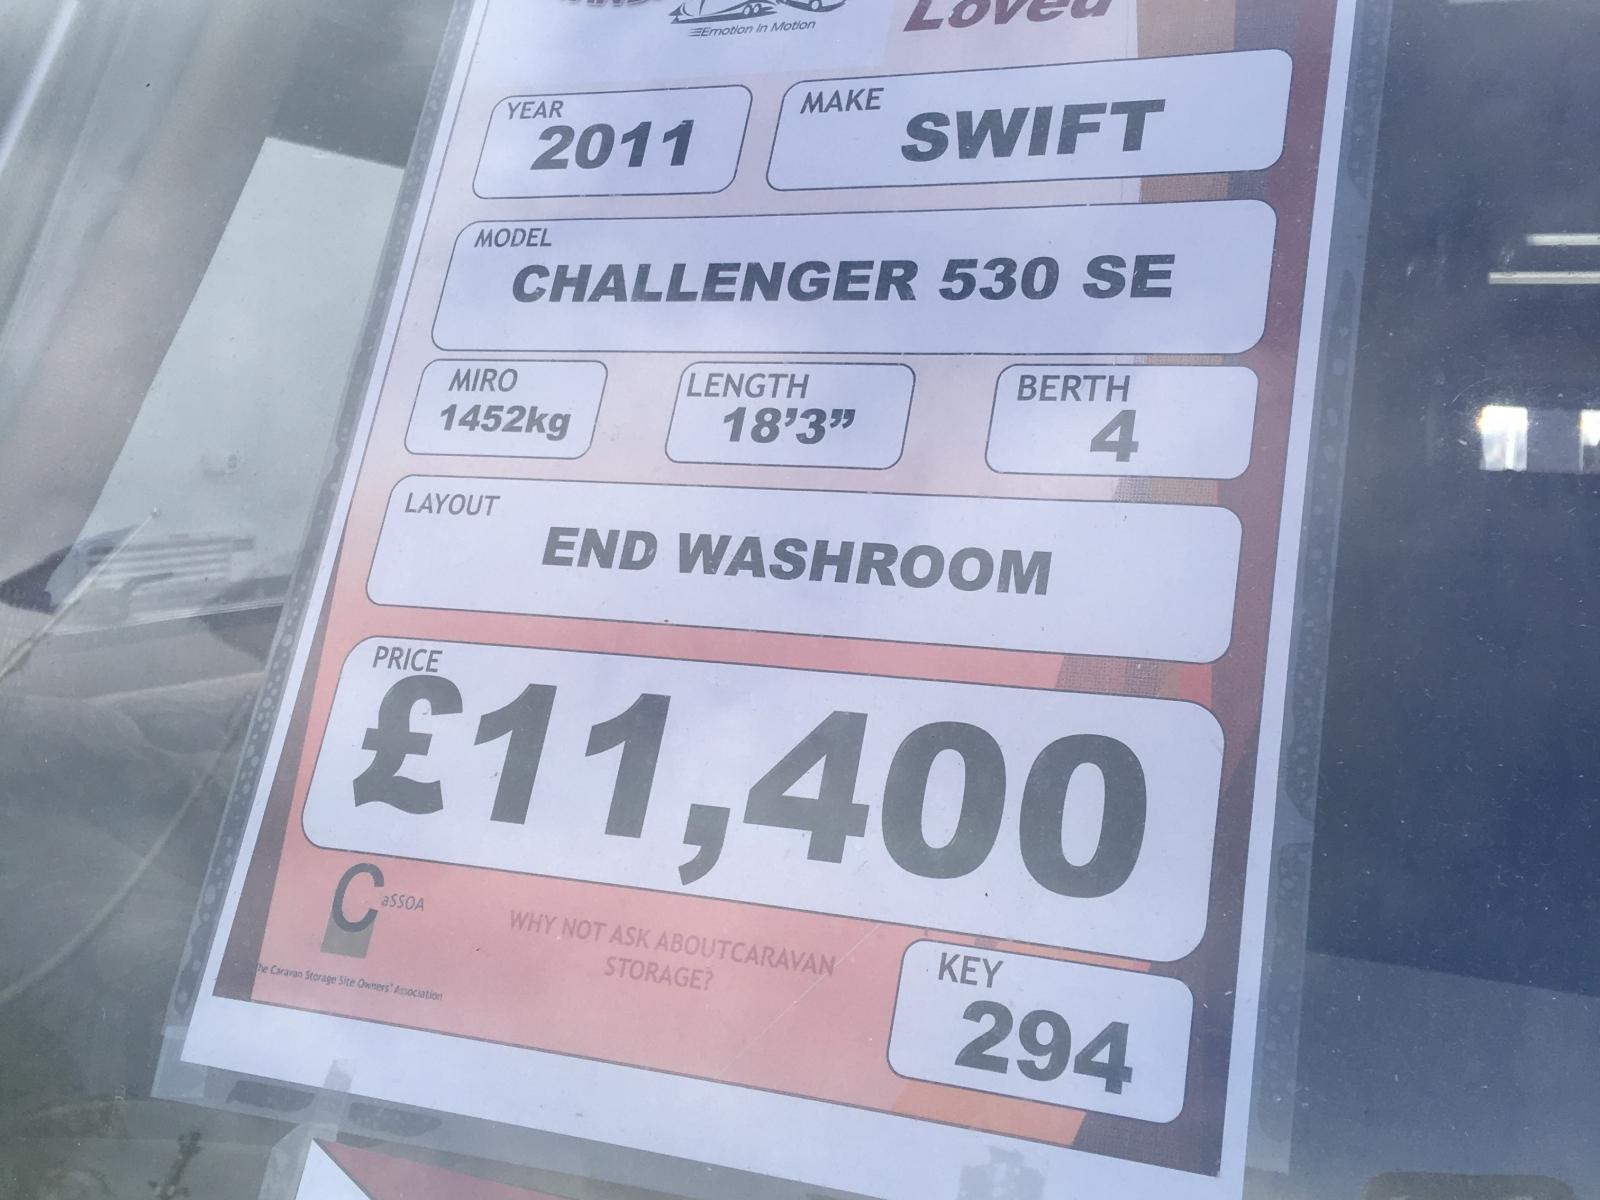 Swift Challenger 530 SE 2011 image